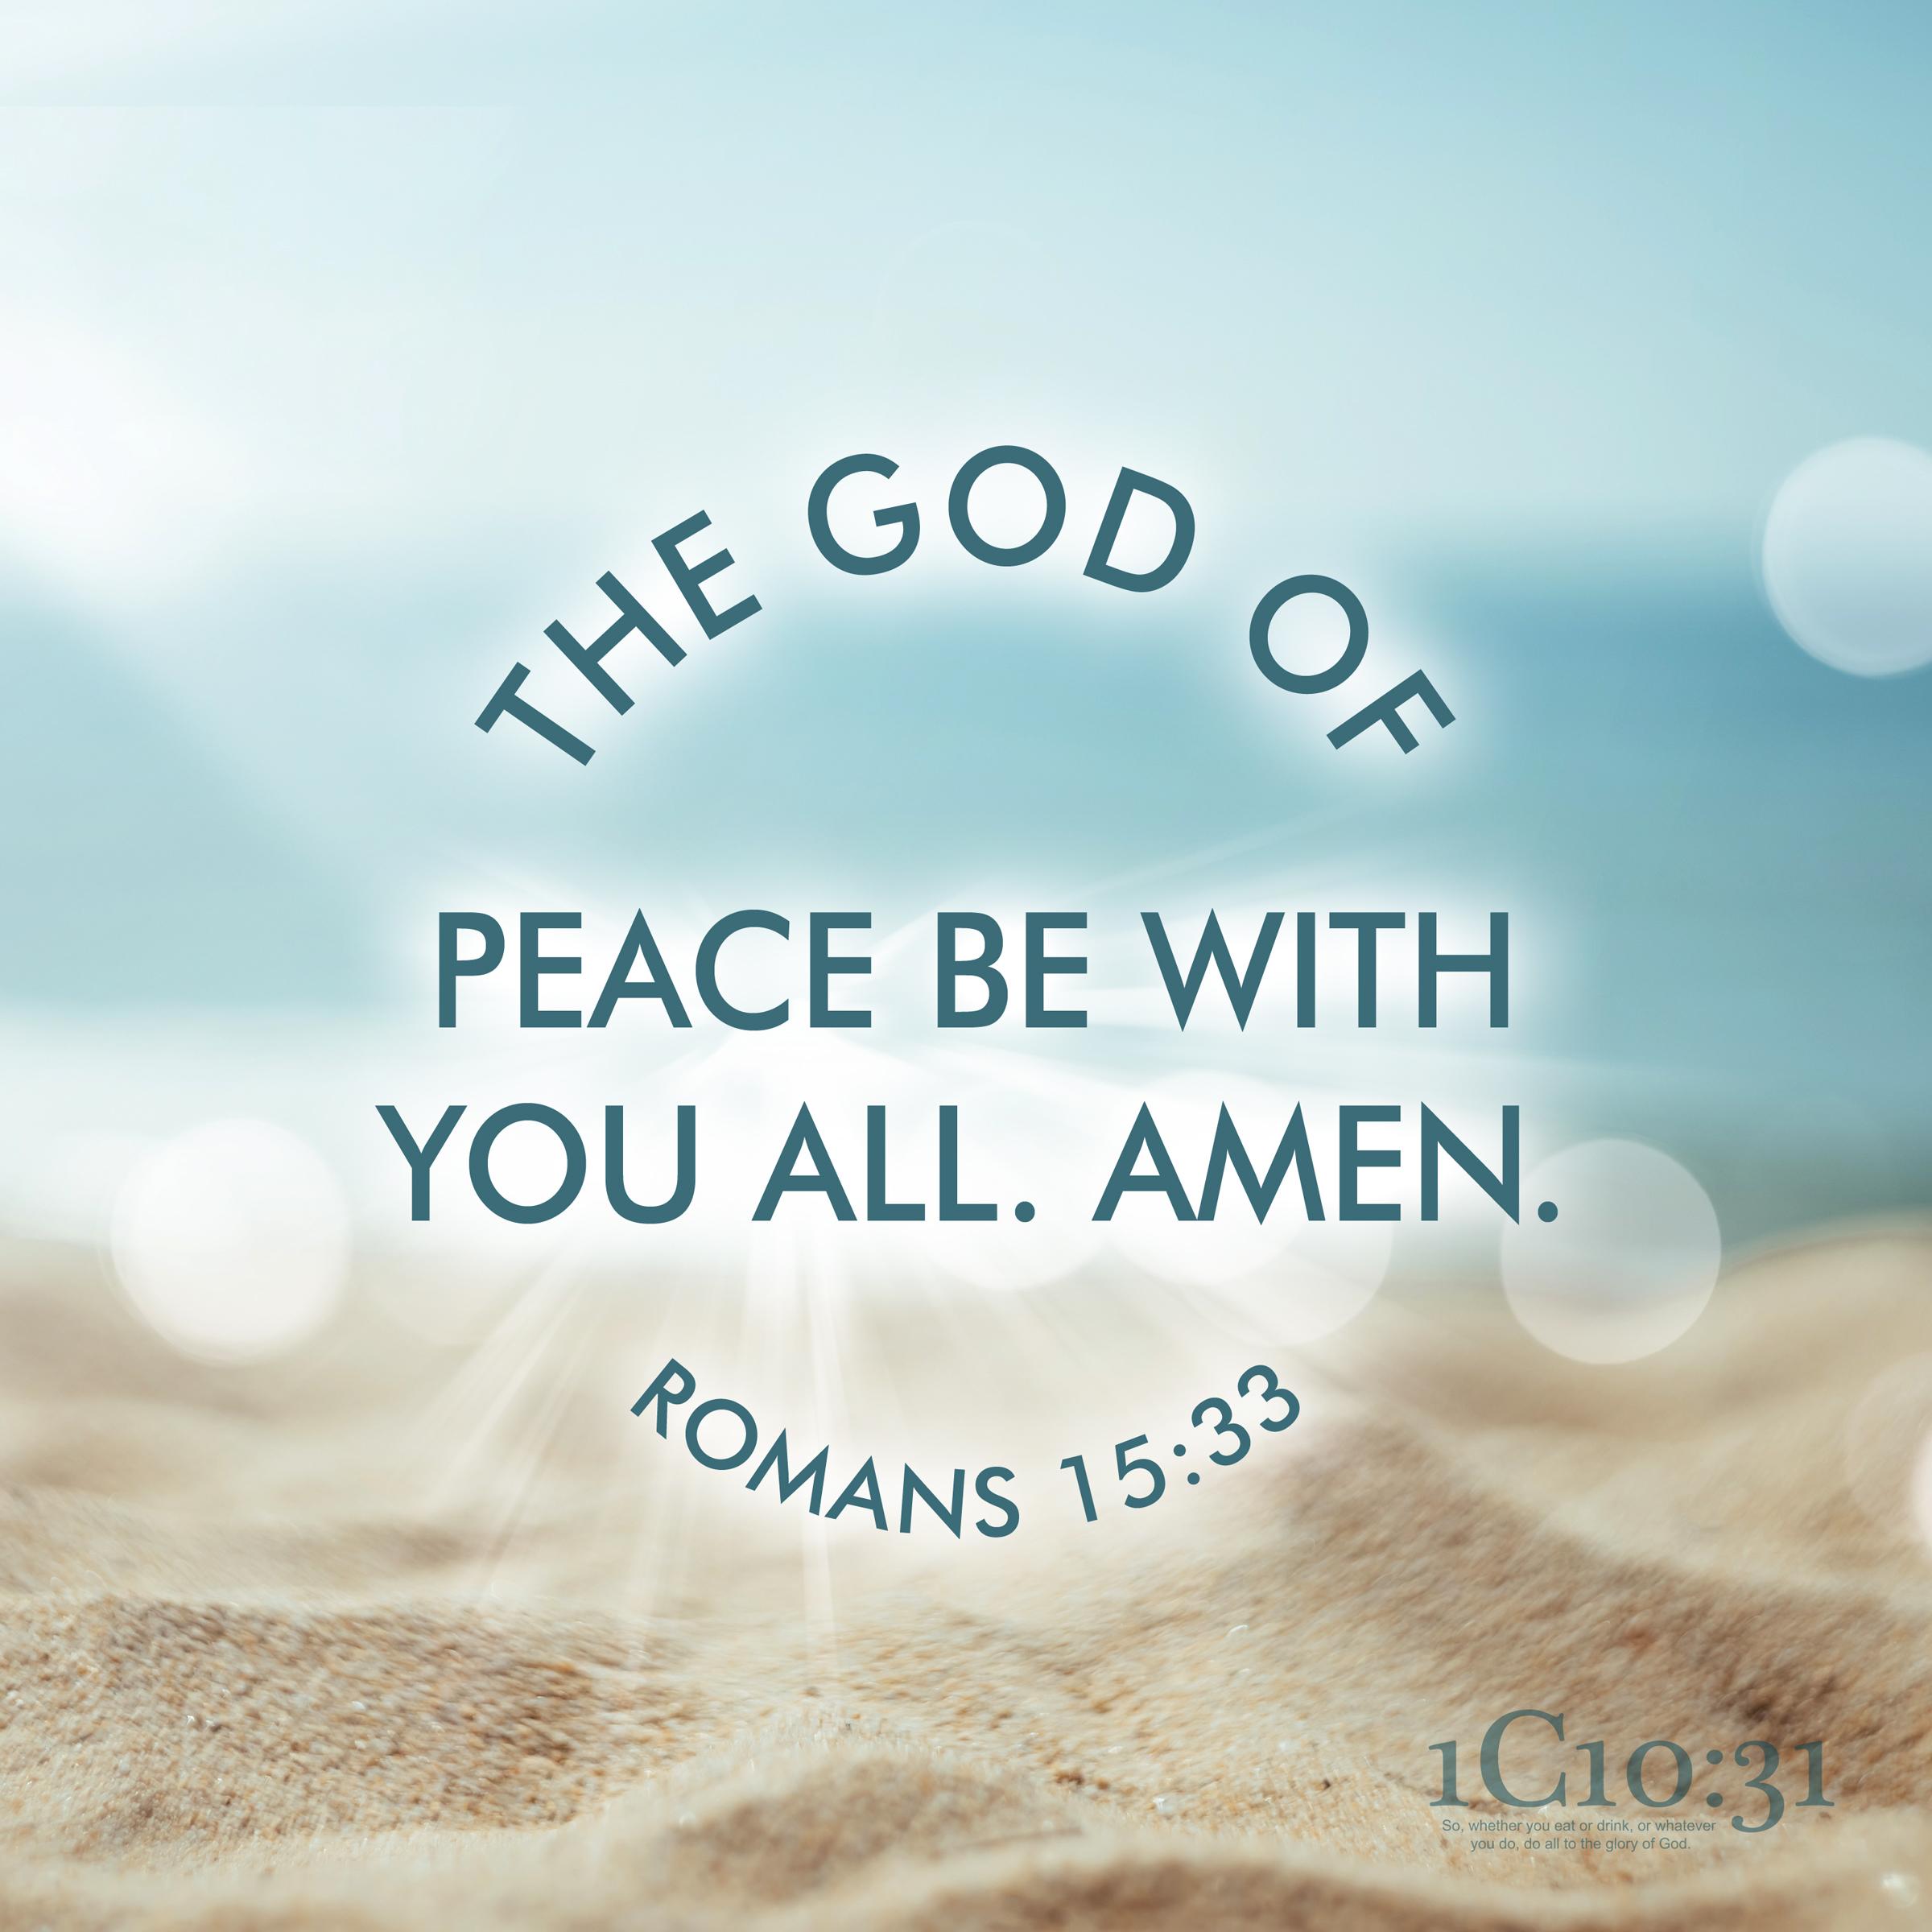 Romans 15:33